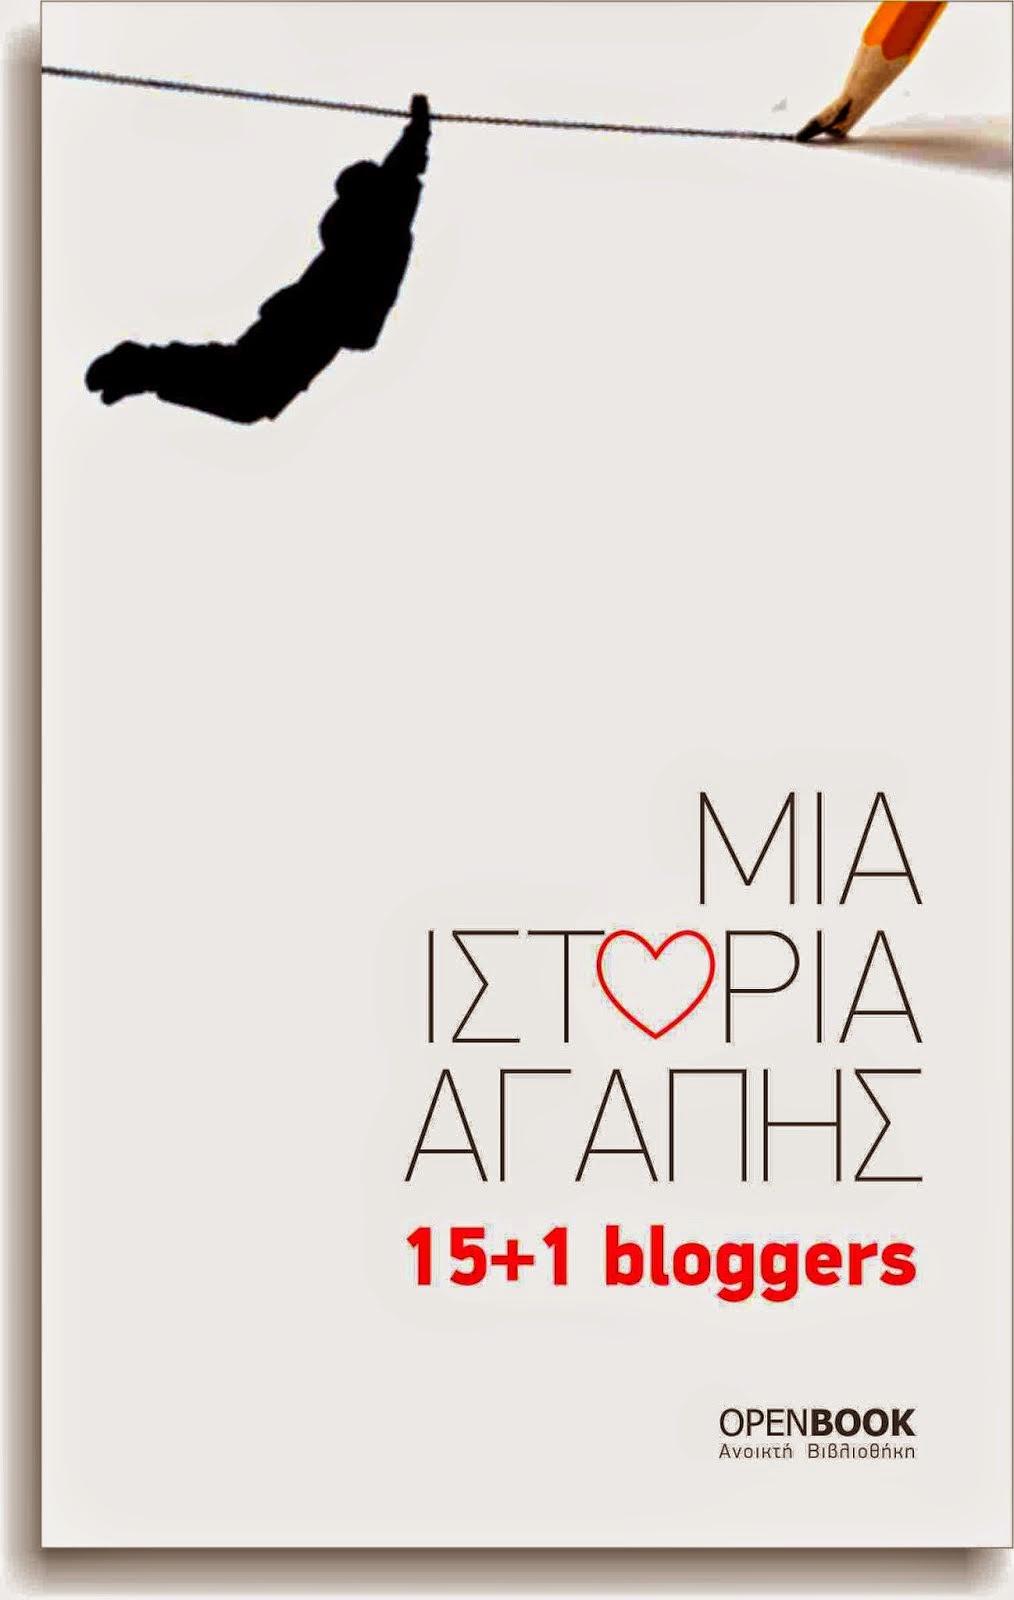 15+1 Bloggers, Μια ιστορία Αγάπης!